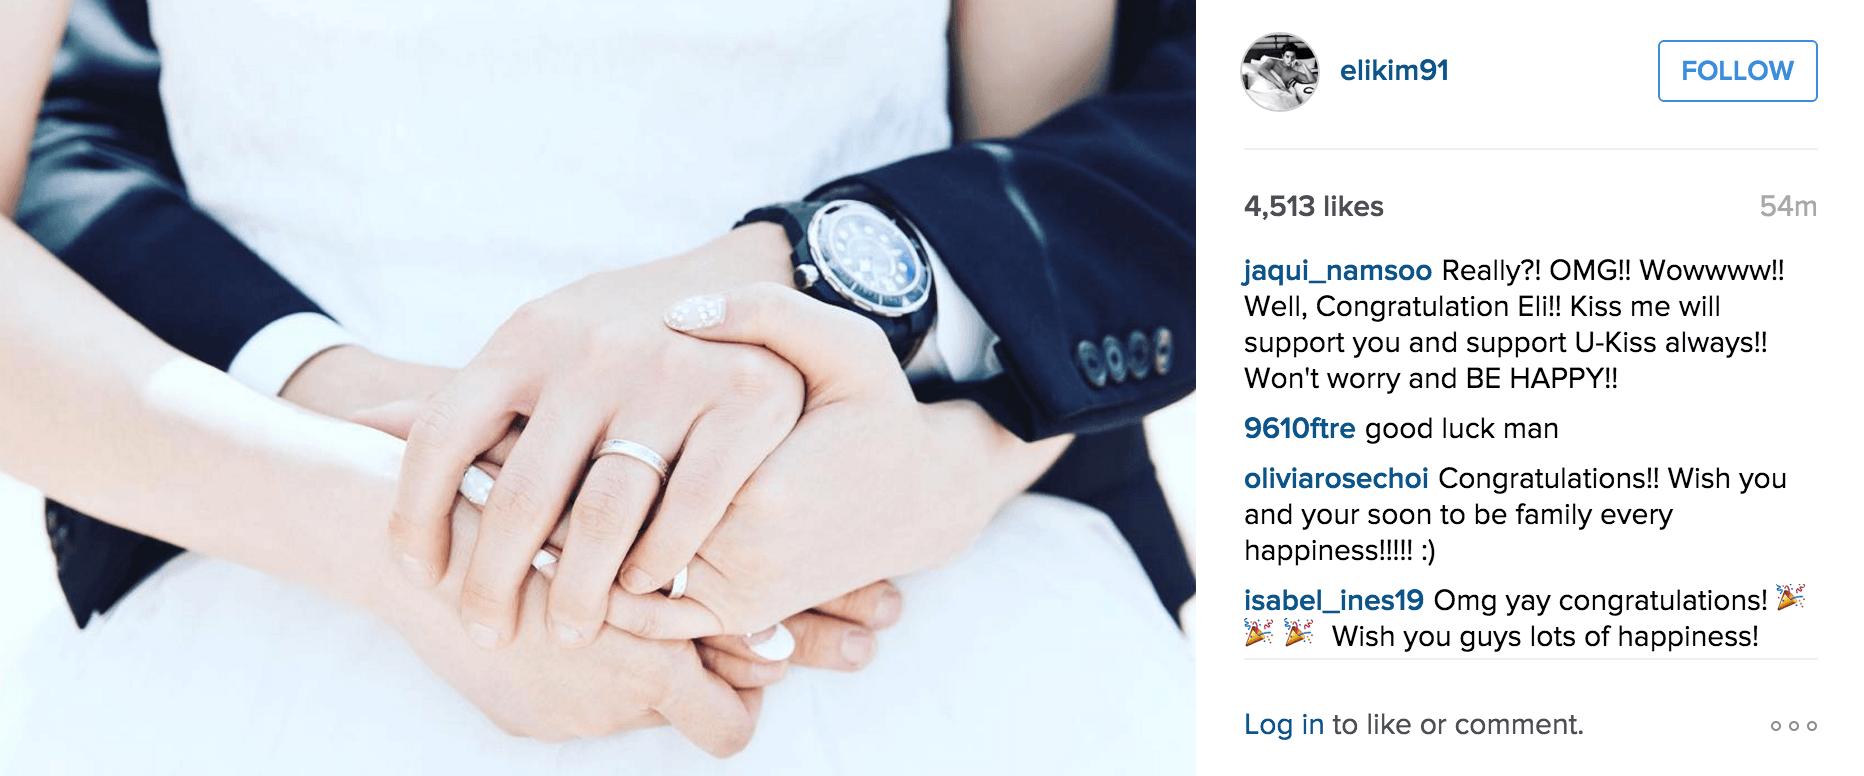 Image: Eli's Instagram